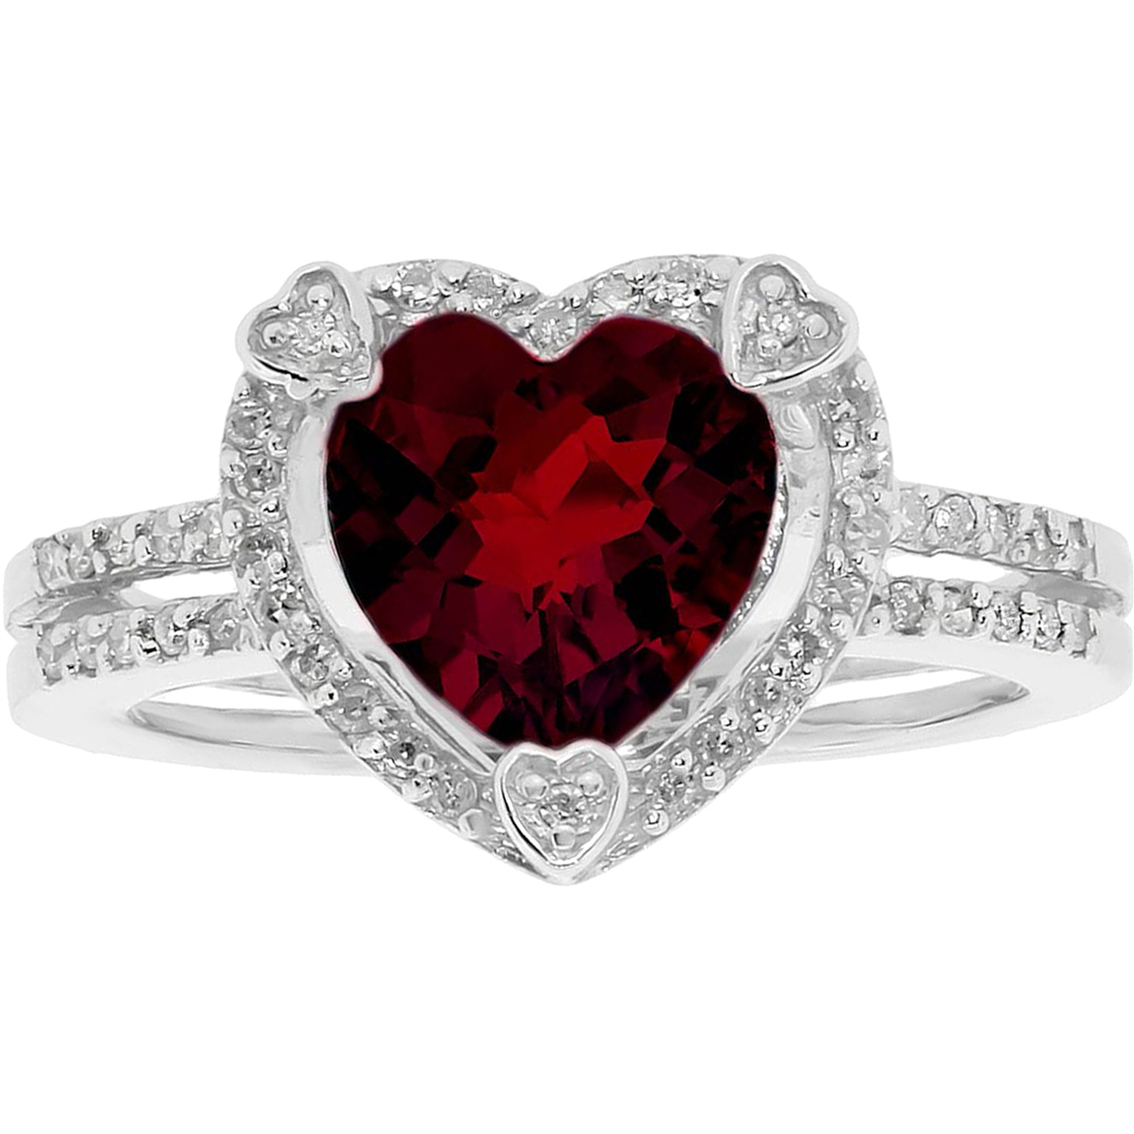 Angara Heart Shaped Garnet Halo Ring with Diamond Accents qJmJK